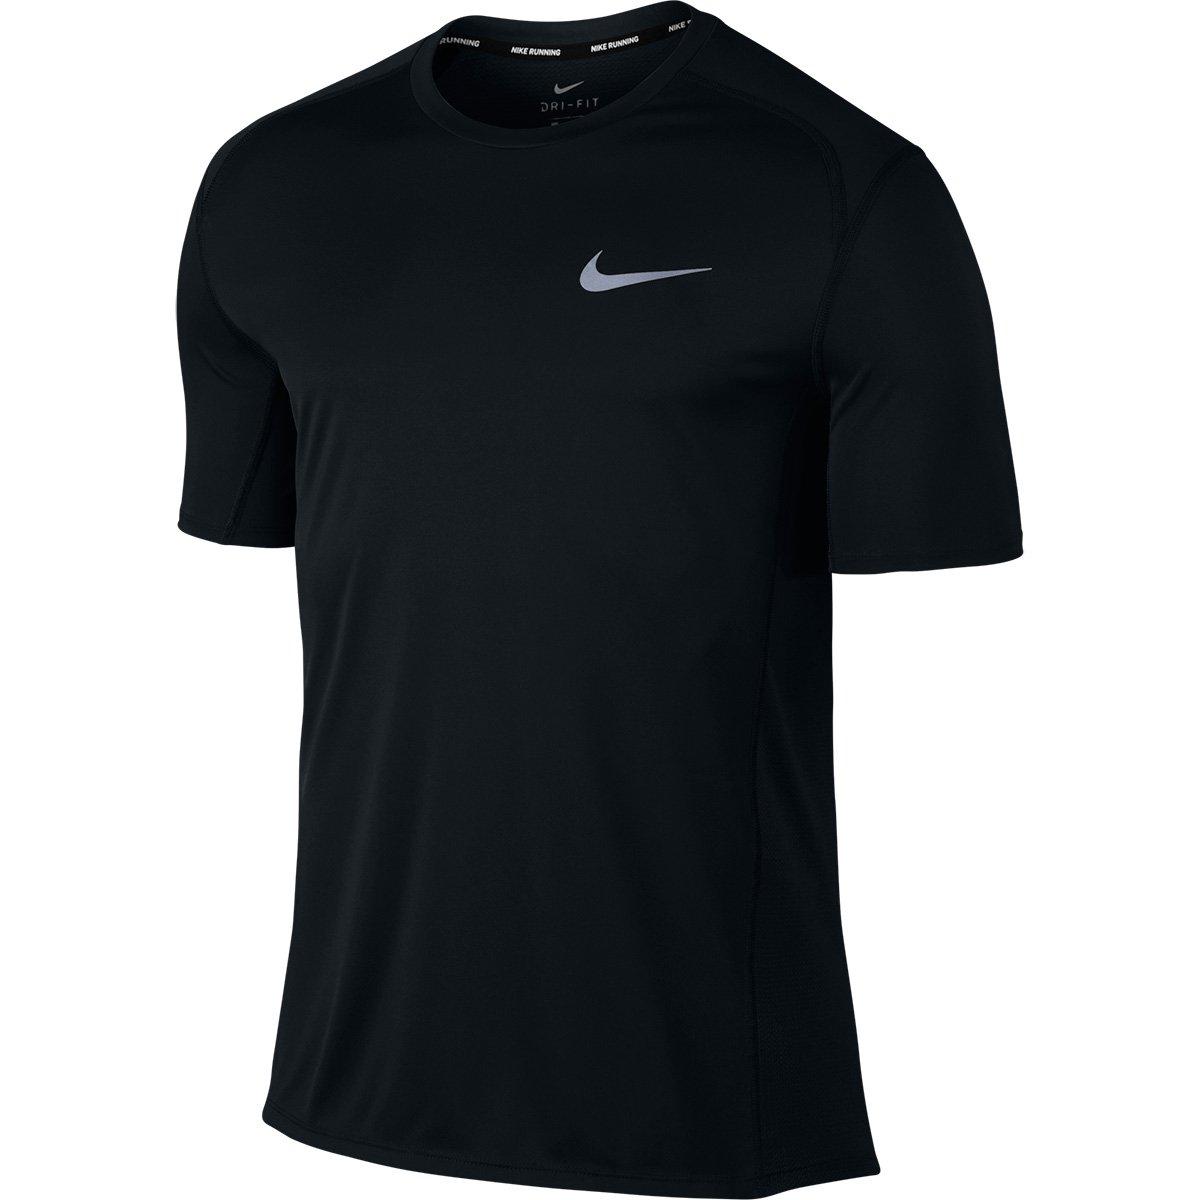 decc43fd062c8e Camiseta Nike Dri-Fit Miler Masculina - Preto | Shop Timão